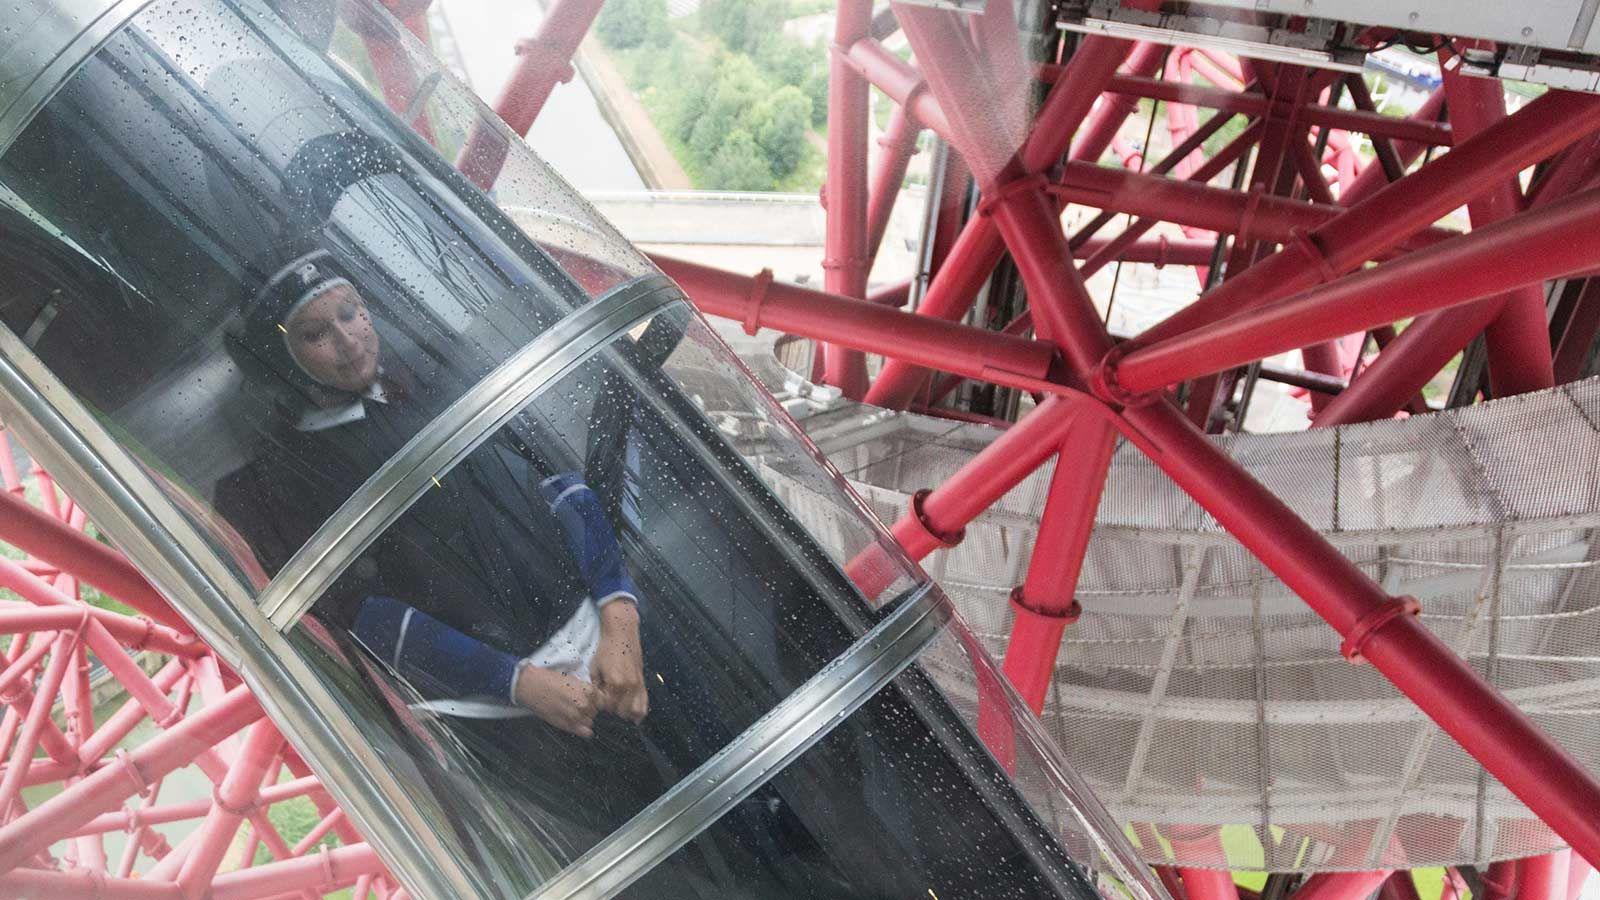 London Stratford ArcelorMittal Orbit & Slide - Queen Elizabeth Olympic Park - Mace Group